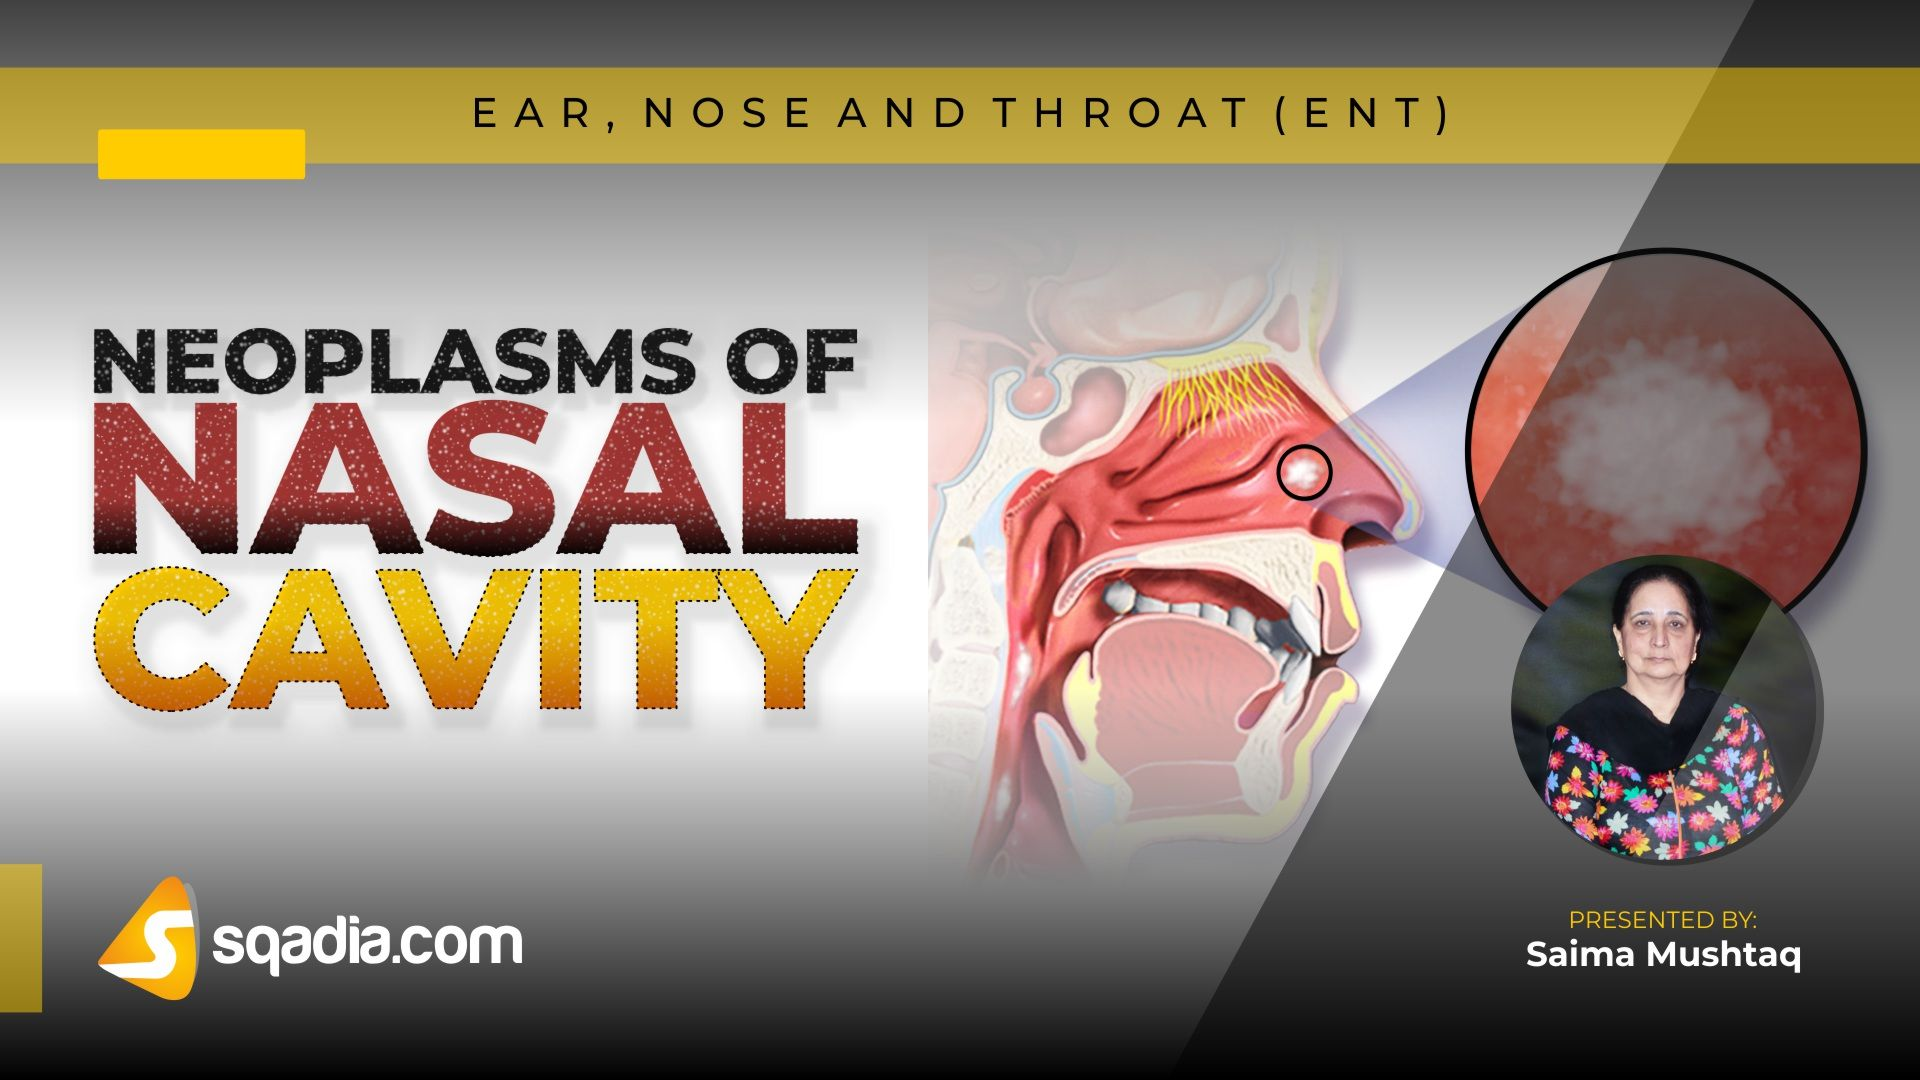 papilloma nasal vestibule